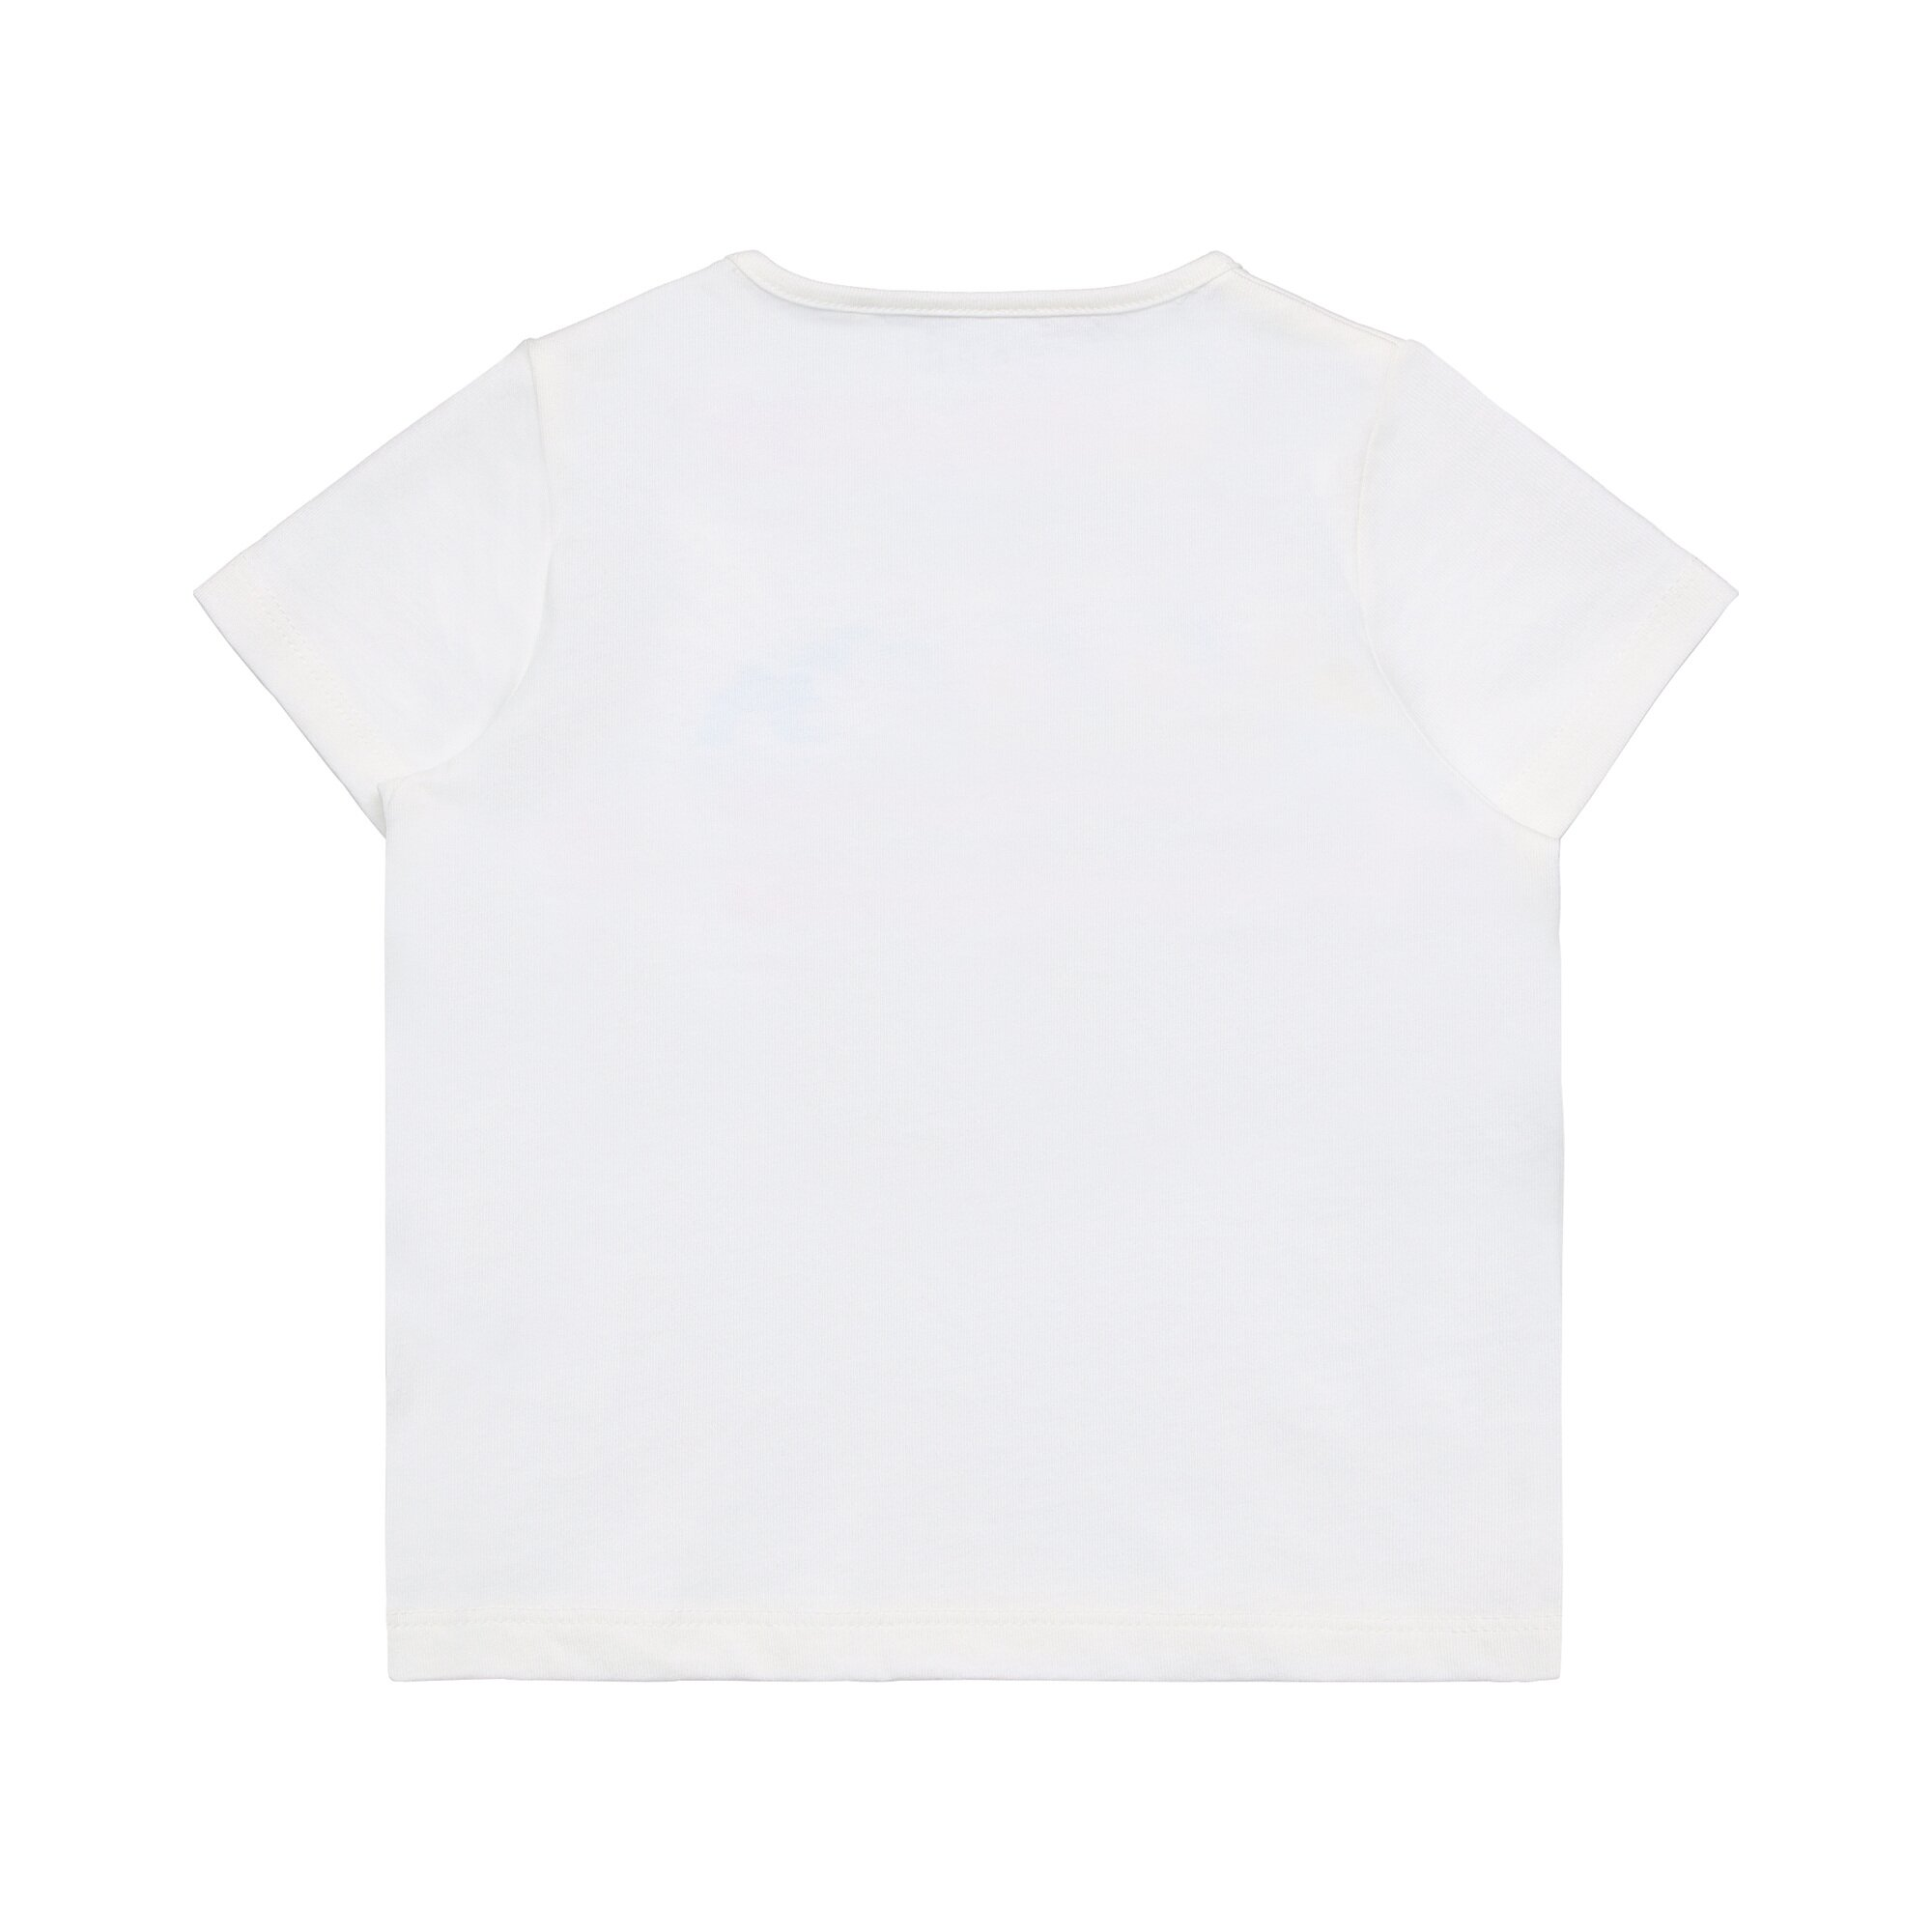 esprit-t-shirt-herz